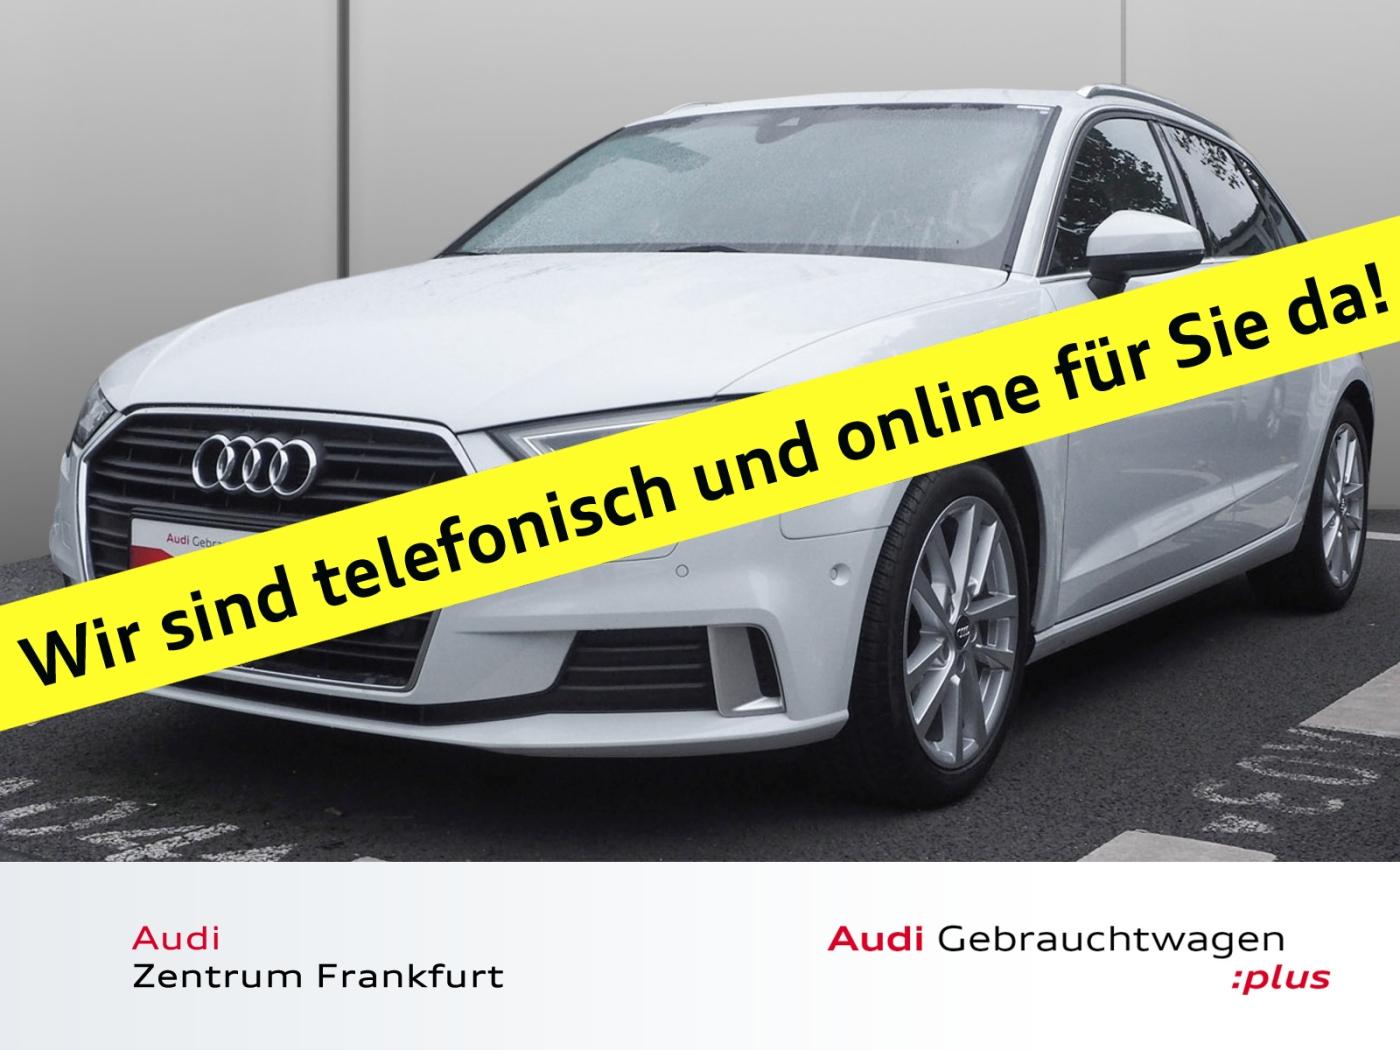 Audi A3 Sportback 1.4 TFSI ultra sport Navi Sitzheizu, Jahr 2016, Benzin